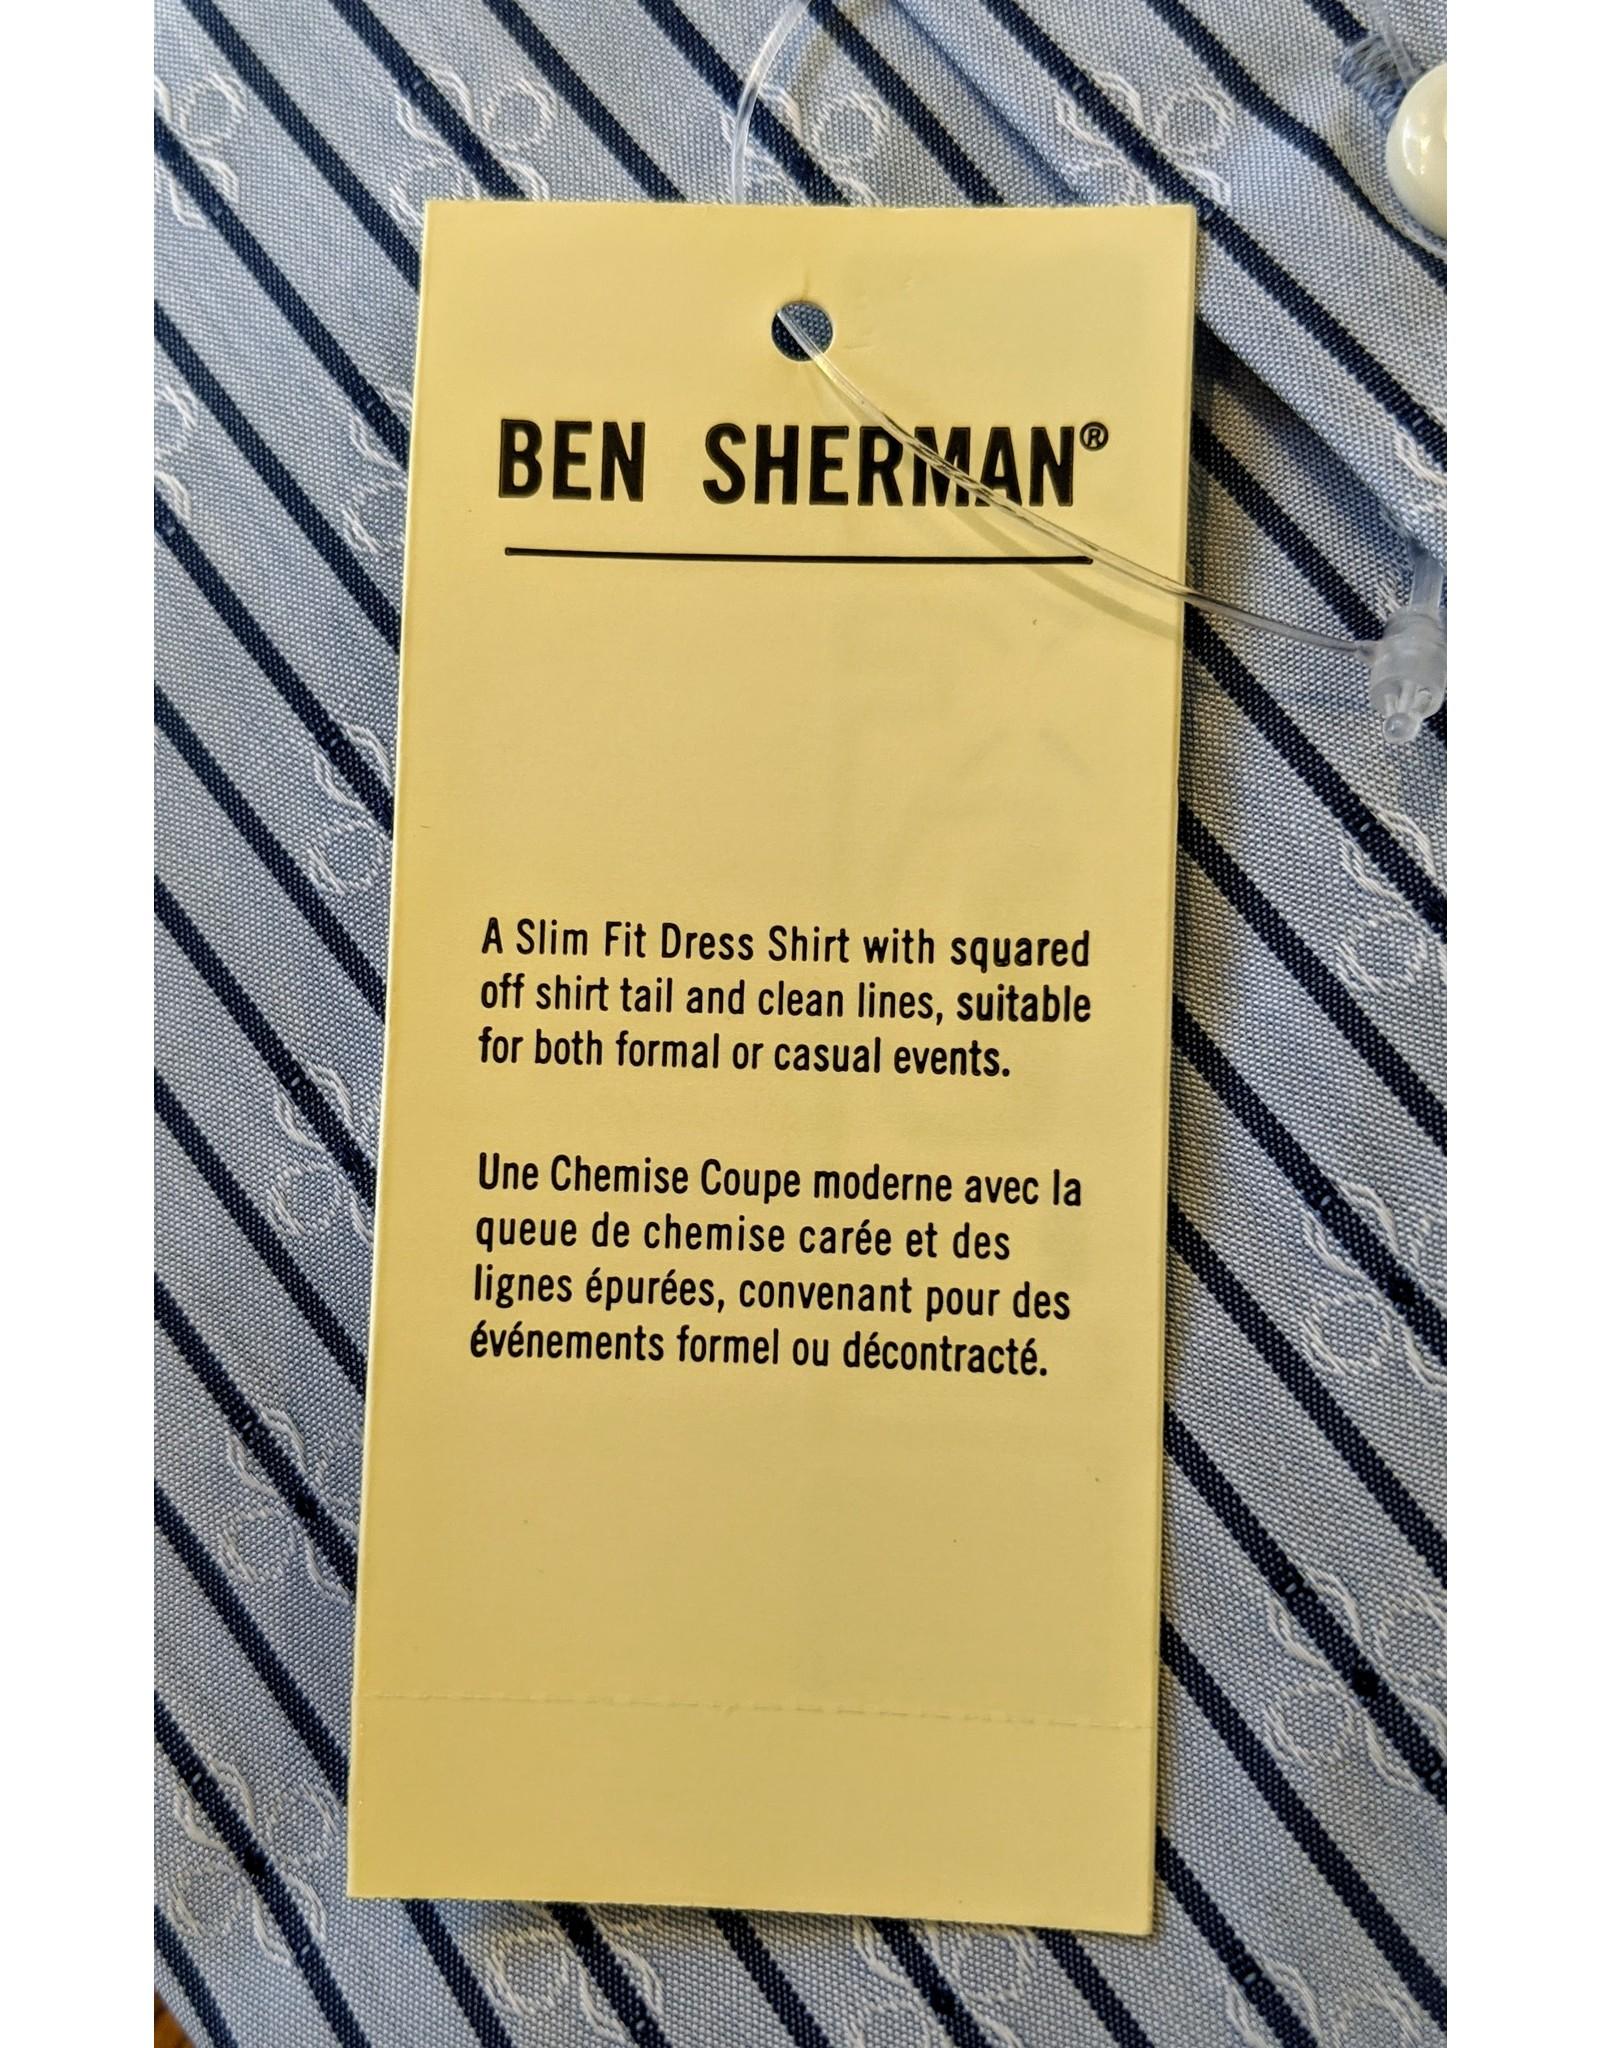 Ben Sherman Ben Sherman Slim Fit Dress Shirt